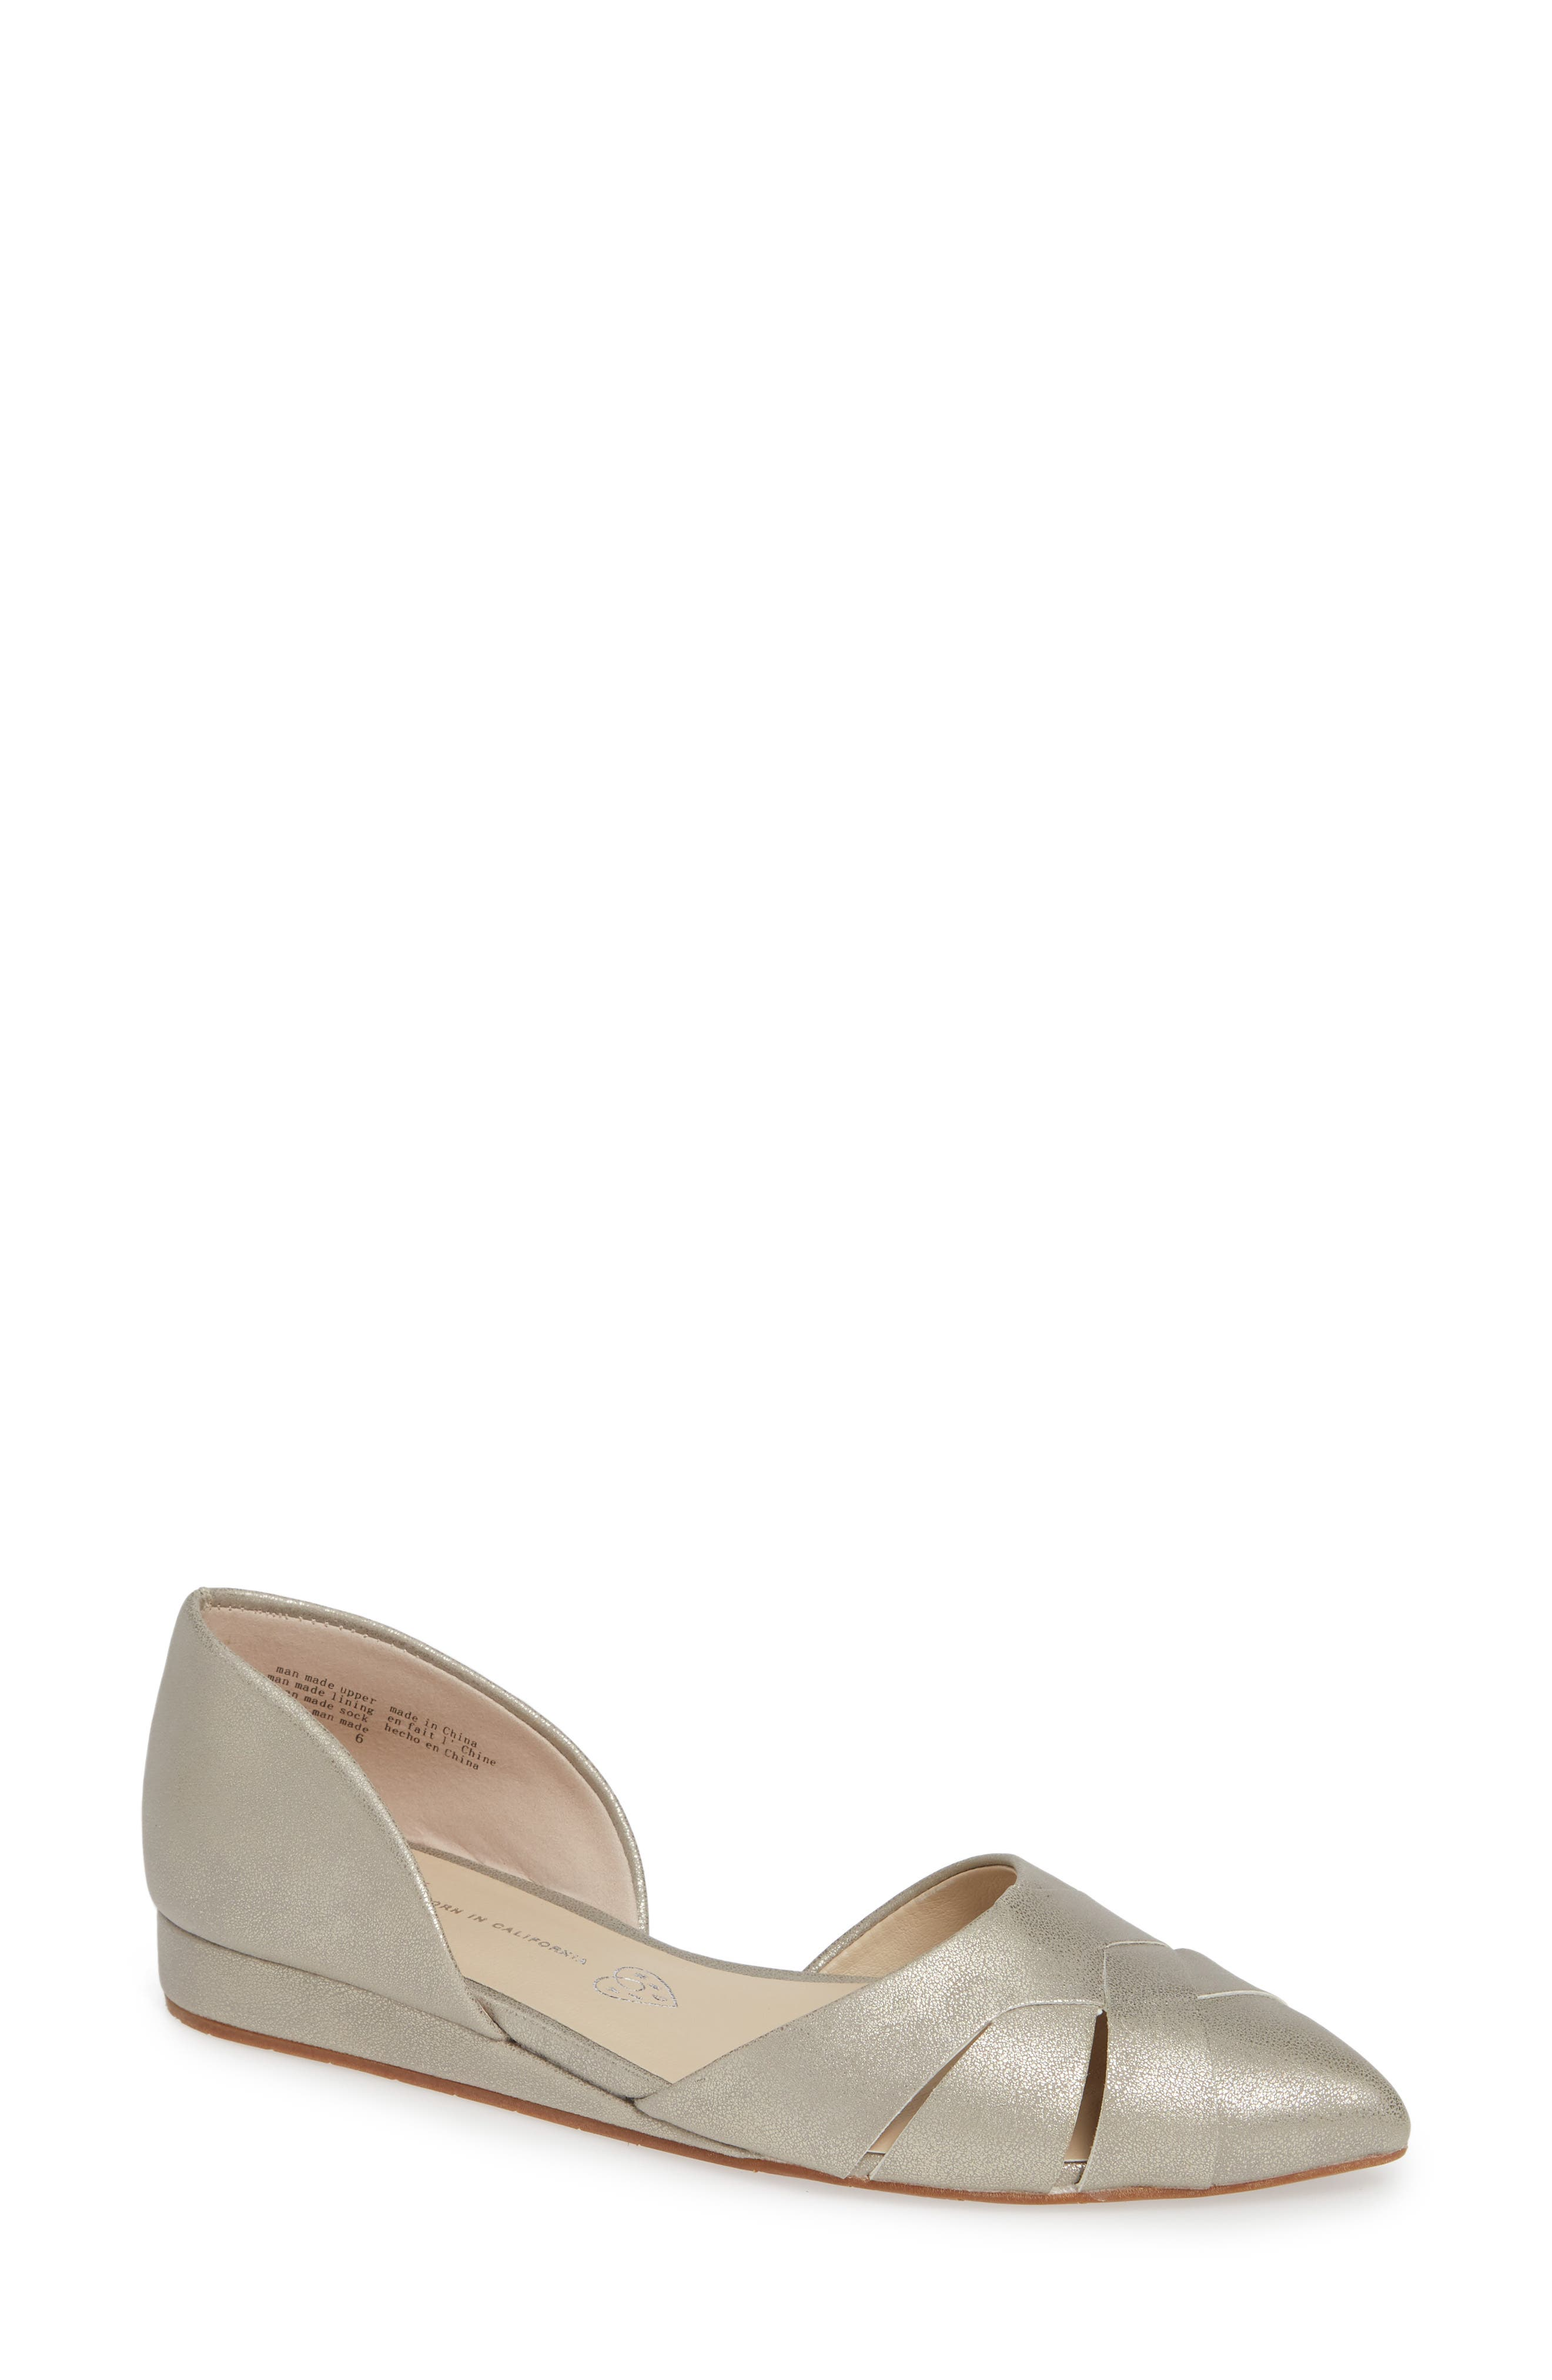 Bc Footwear Focal Point Vegan Pointy Toe Flat, Metallic